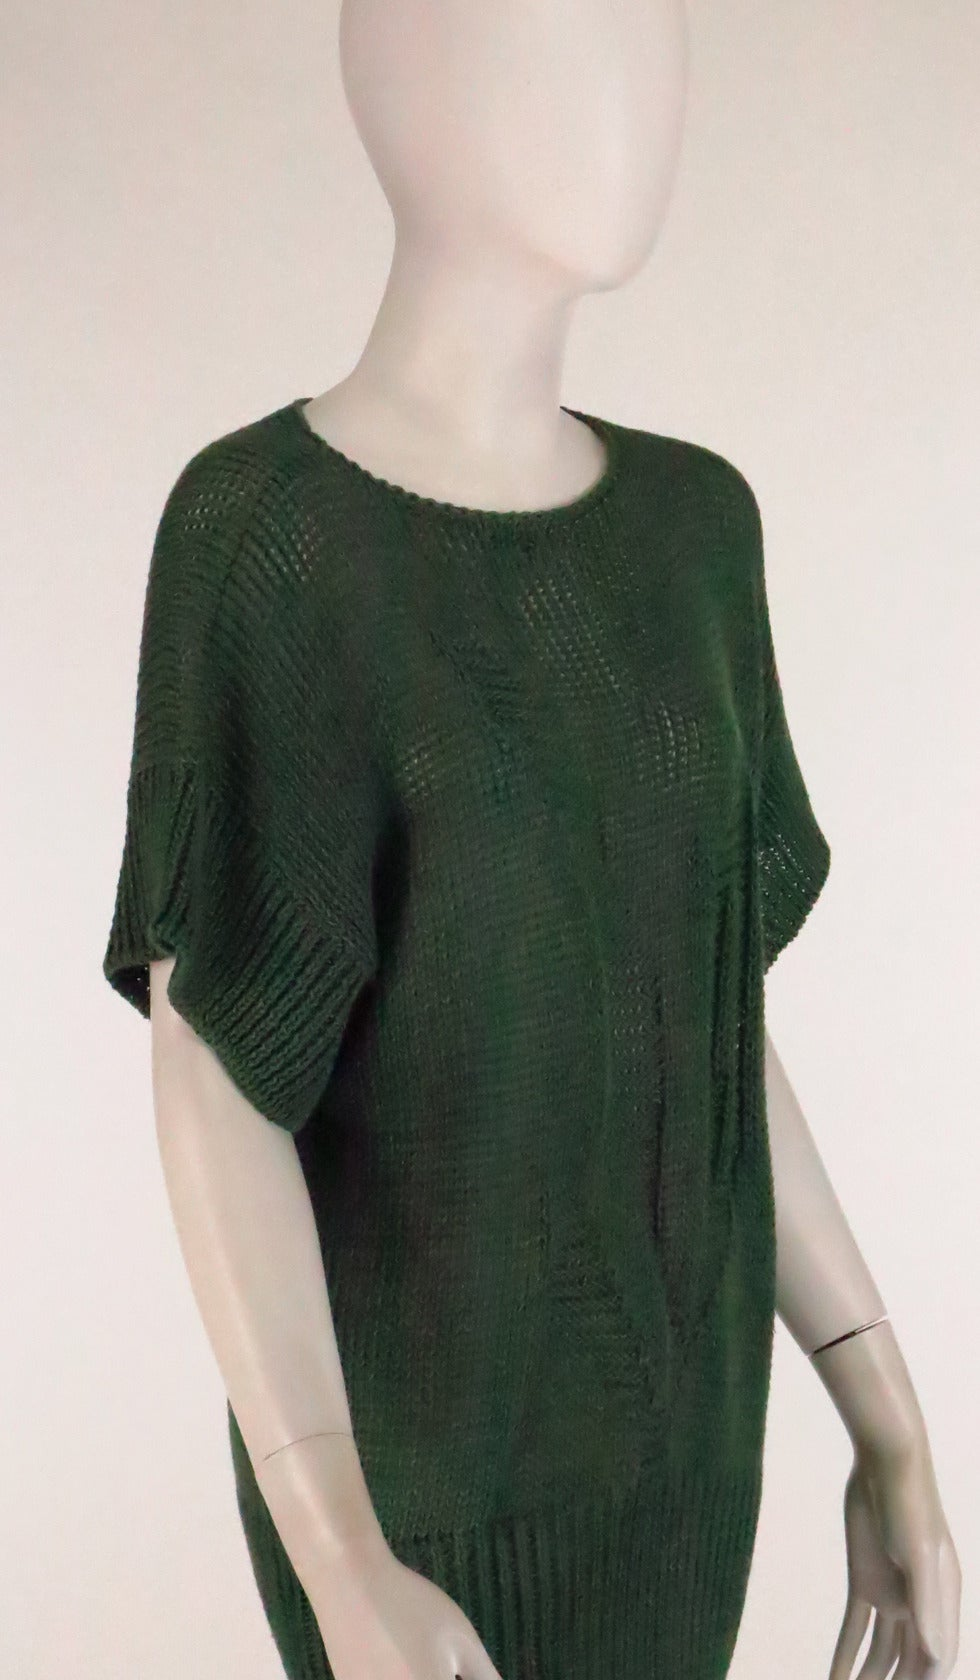 1980s Jil Sander pine green sweater knit tunic 7